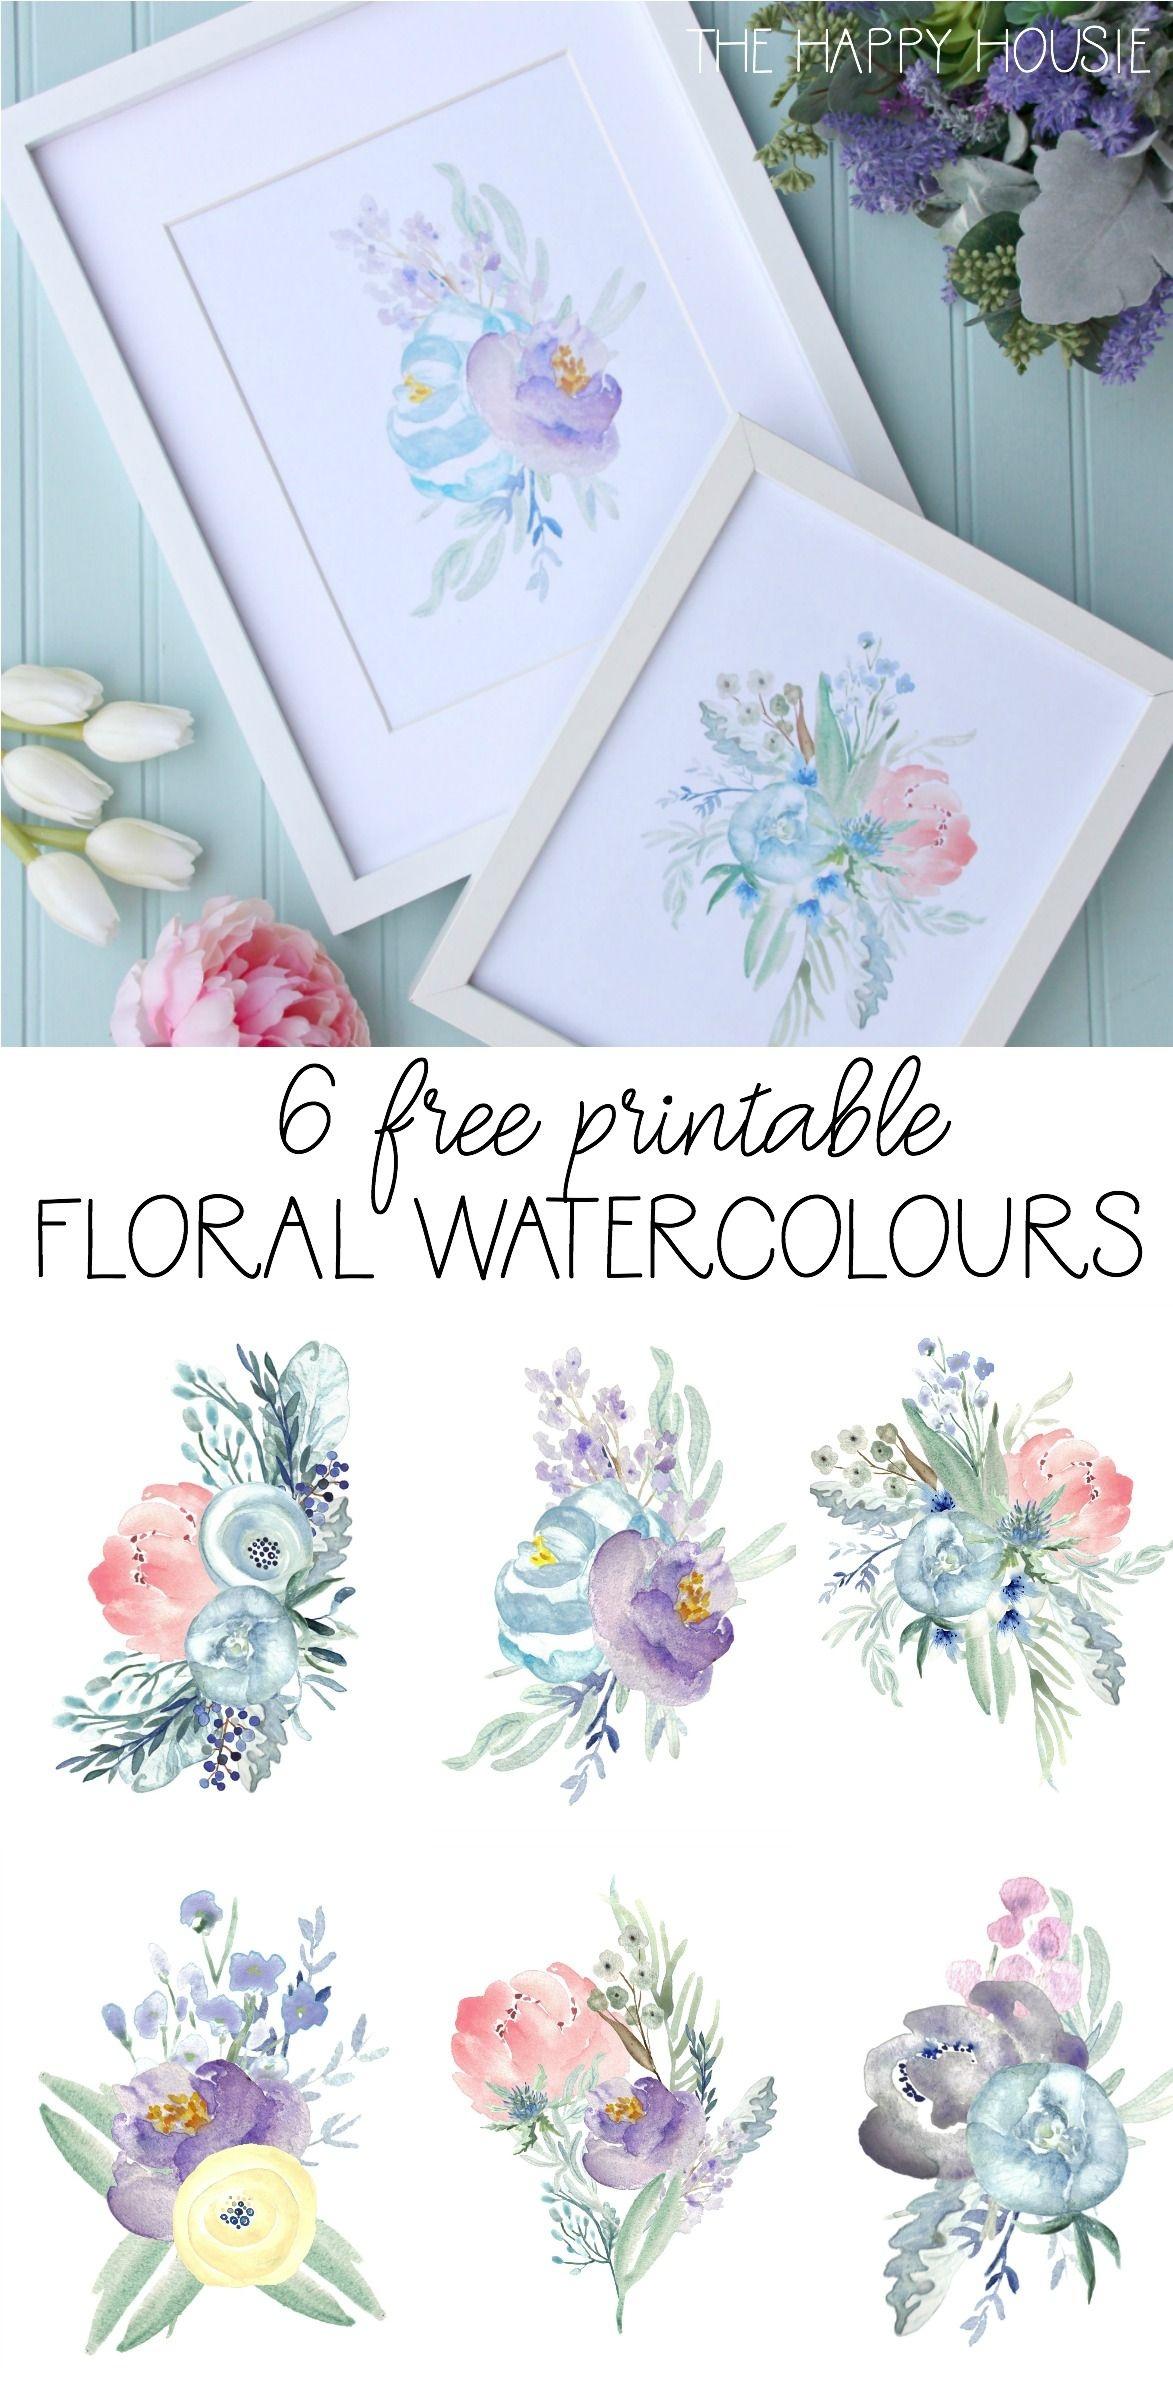 6 Free Printable Floral Watercolour Designs | Printables - Floral Printables Free